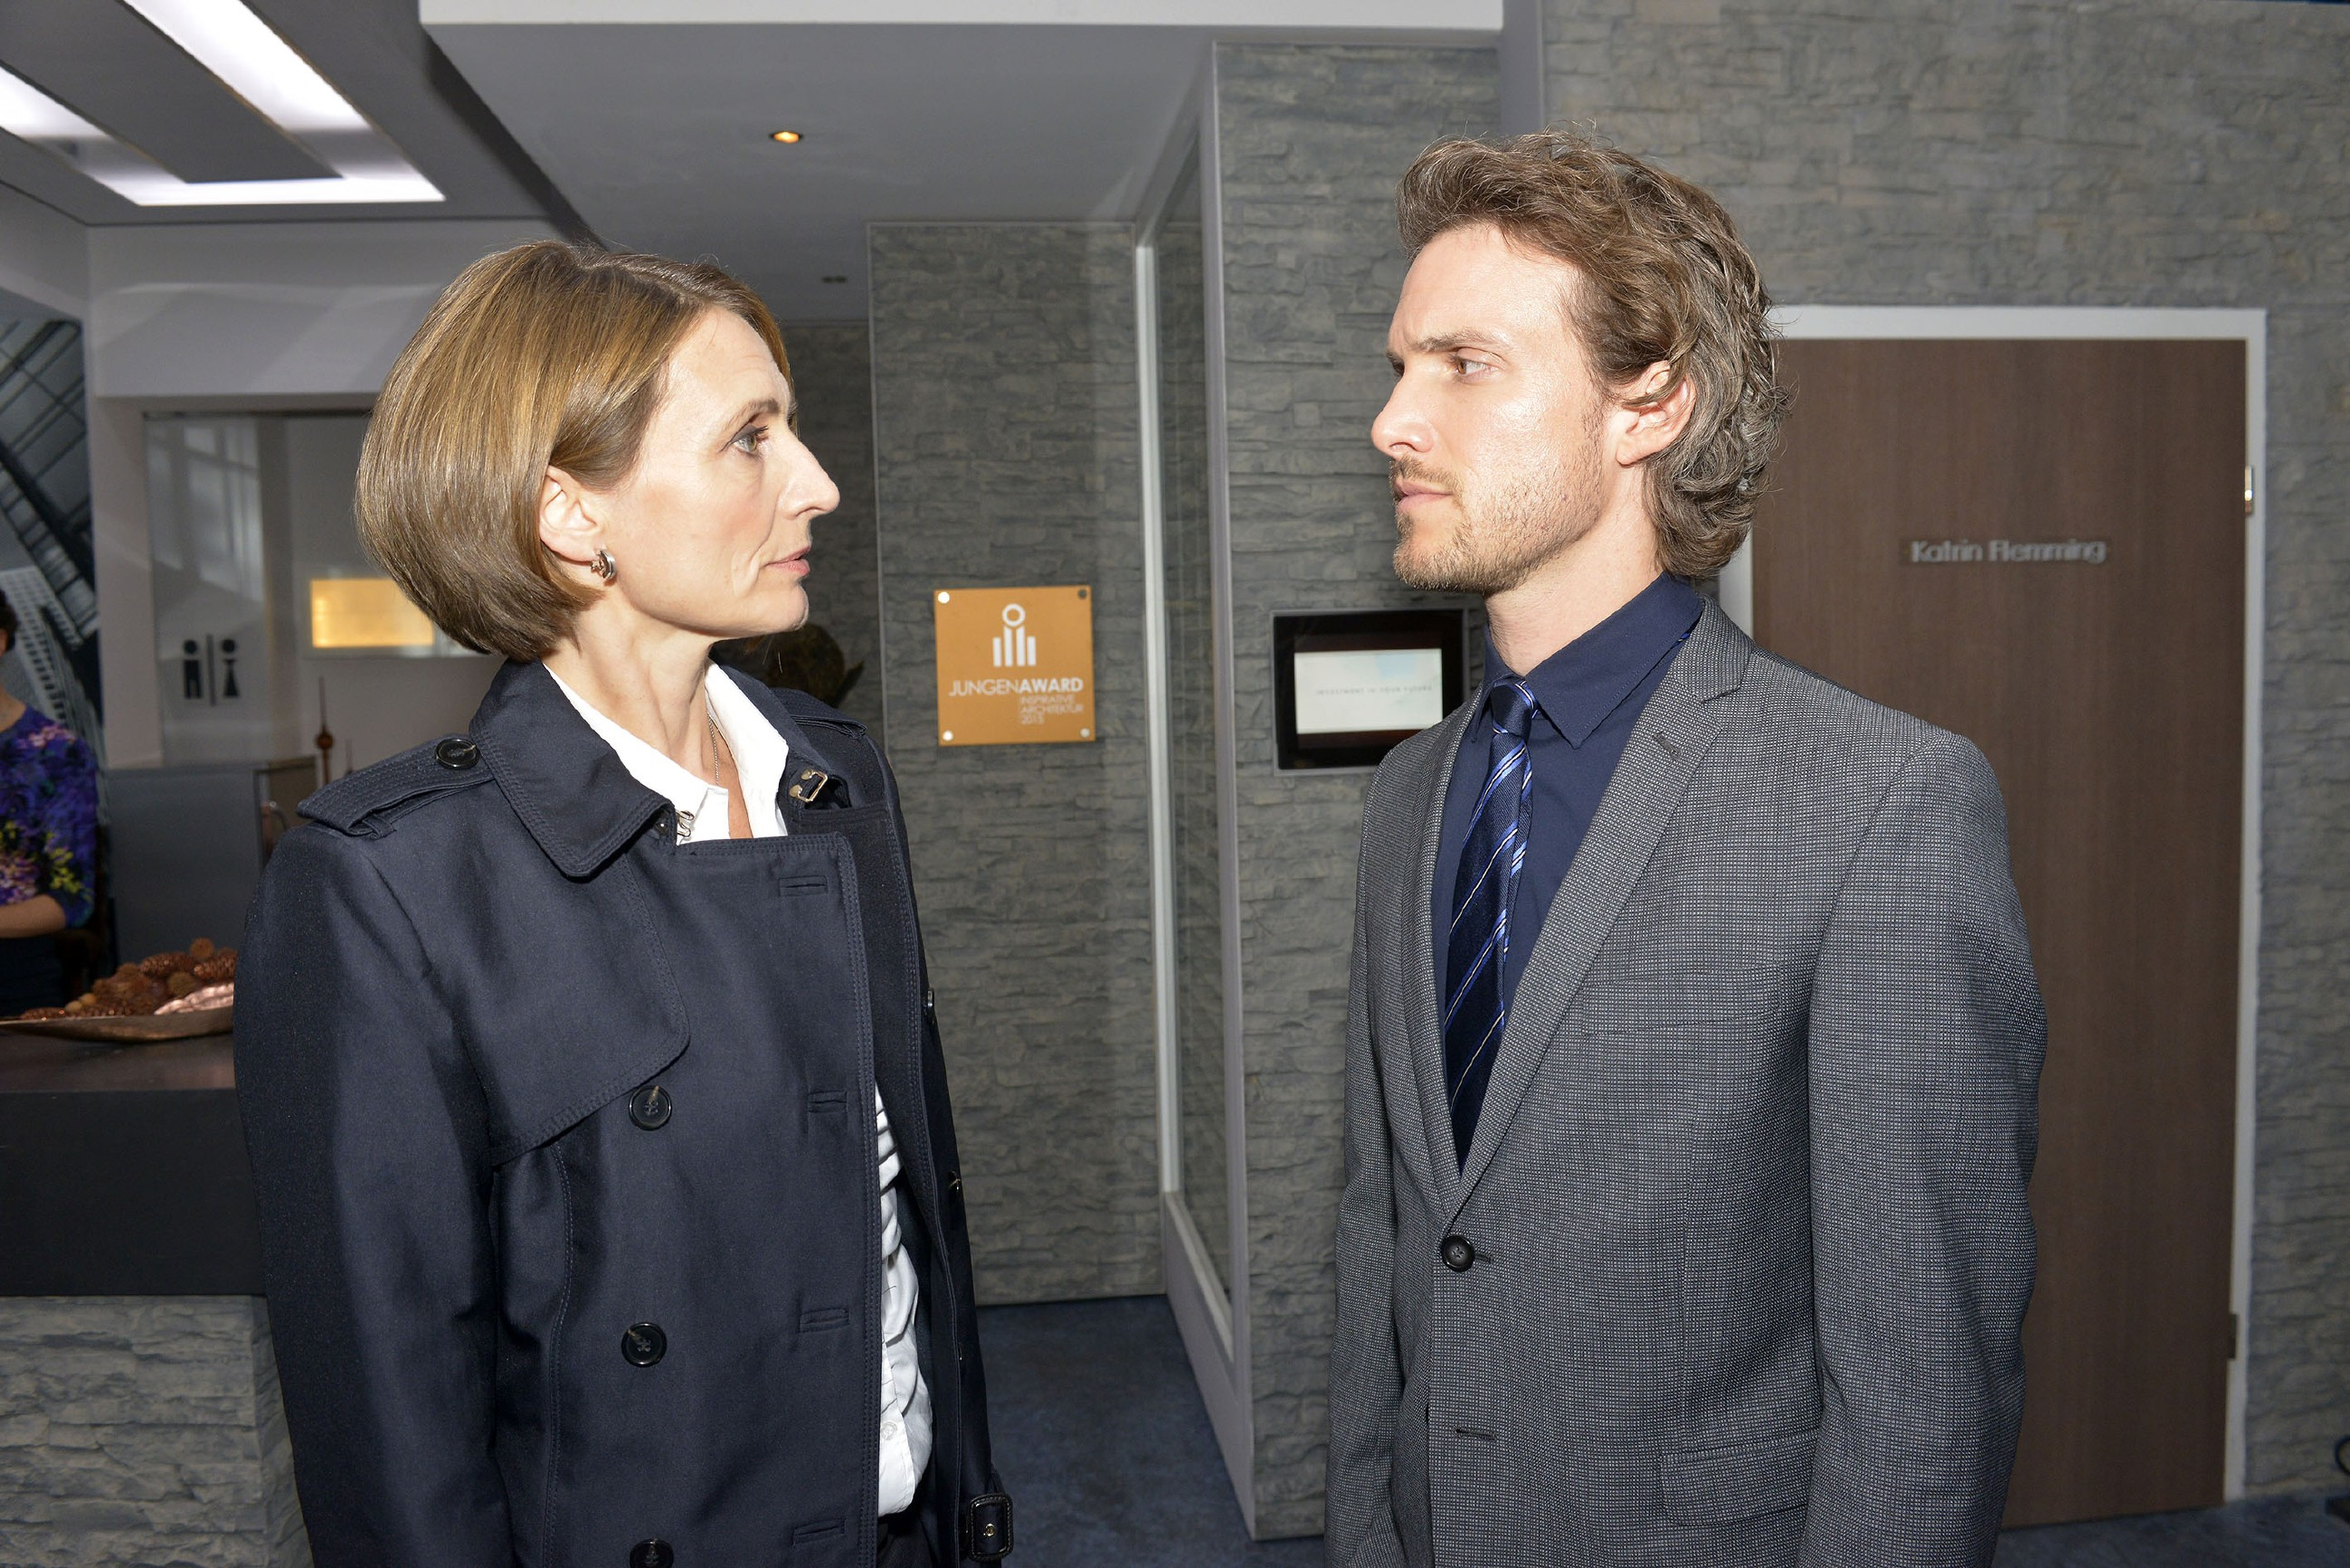 Felix (Thaddäus Meilinger) trifft es hart, als er von Rosa (Joana Schümer) degradiert wird. (Quelle: RTL / Rolf Baumgartner)